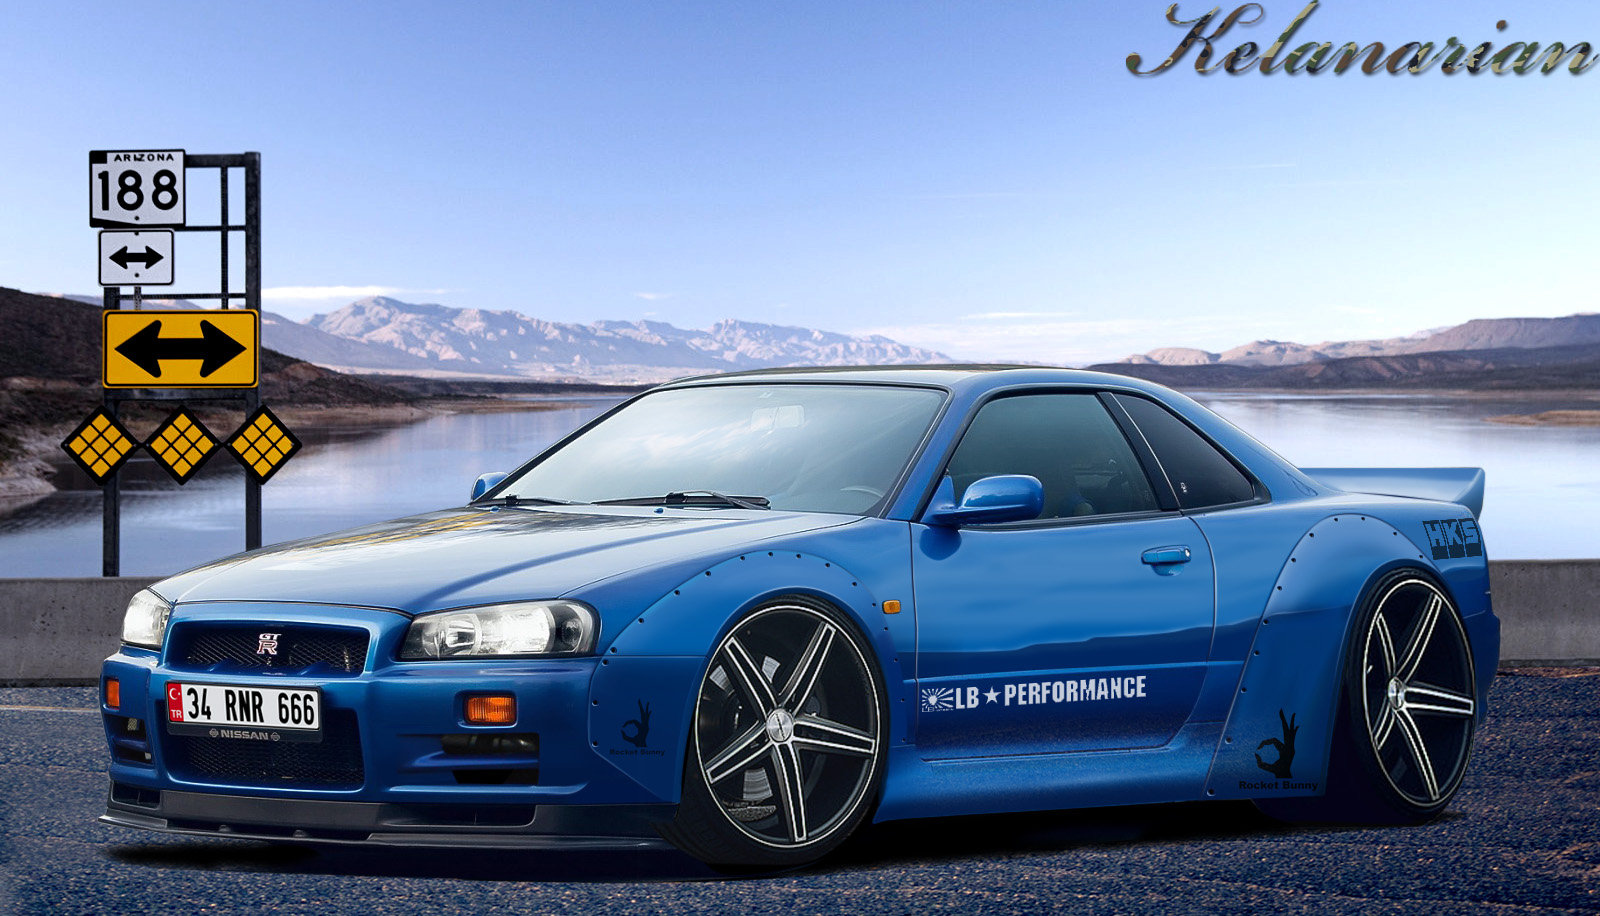 Kelanarian's Profile › Autemo.com › Automotive Design Studio